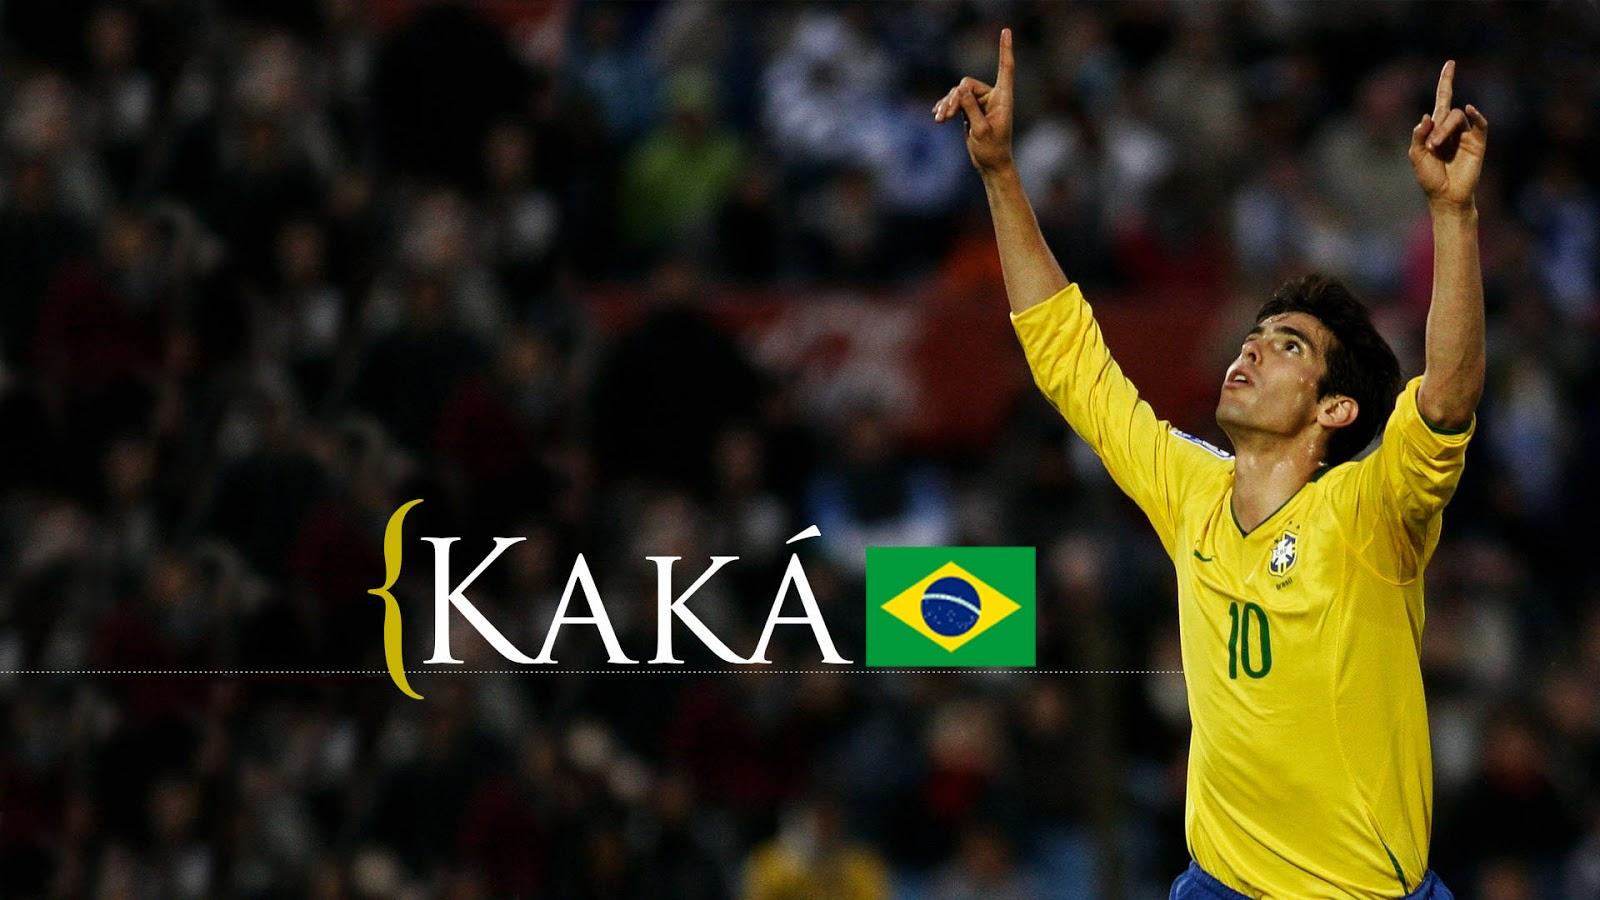 Ricardo Kaka Hd Wallpapers Ricardo Kaka Handsome Football Player Latest Hd Wallpaper